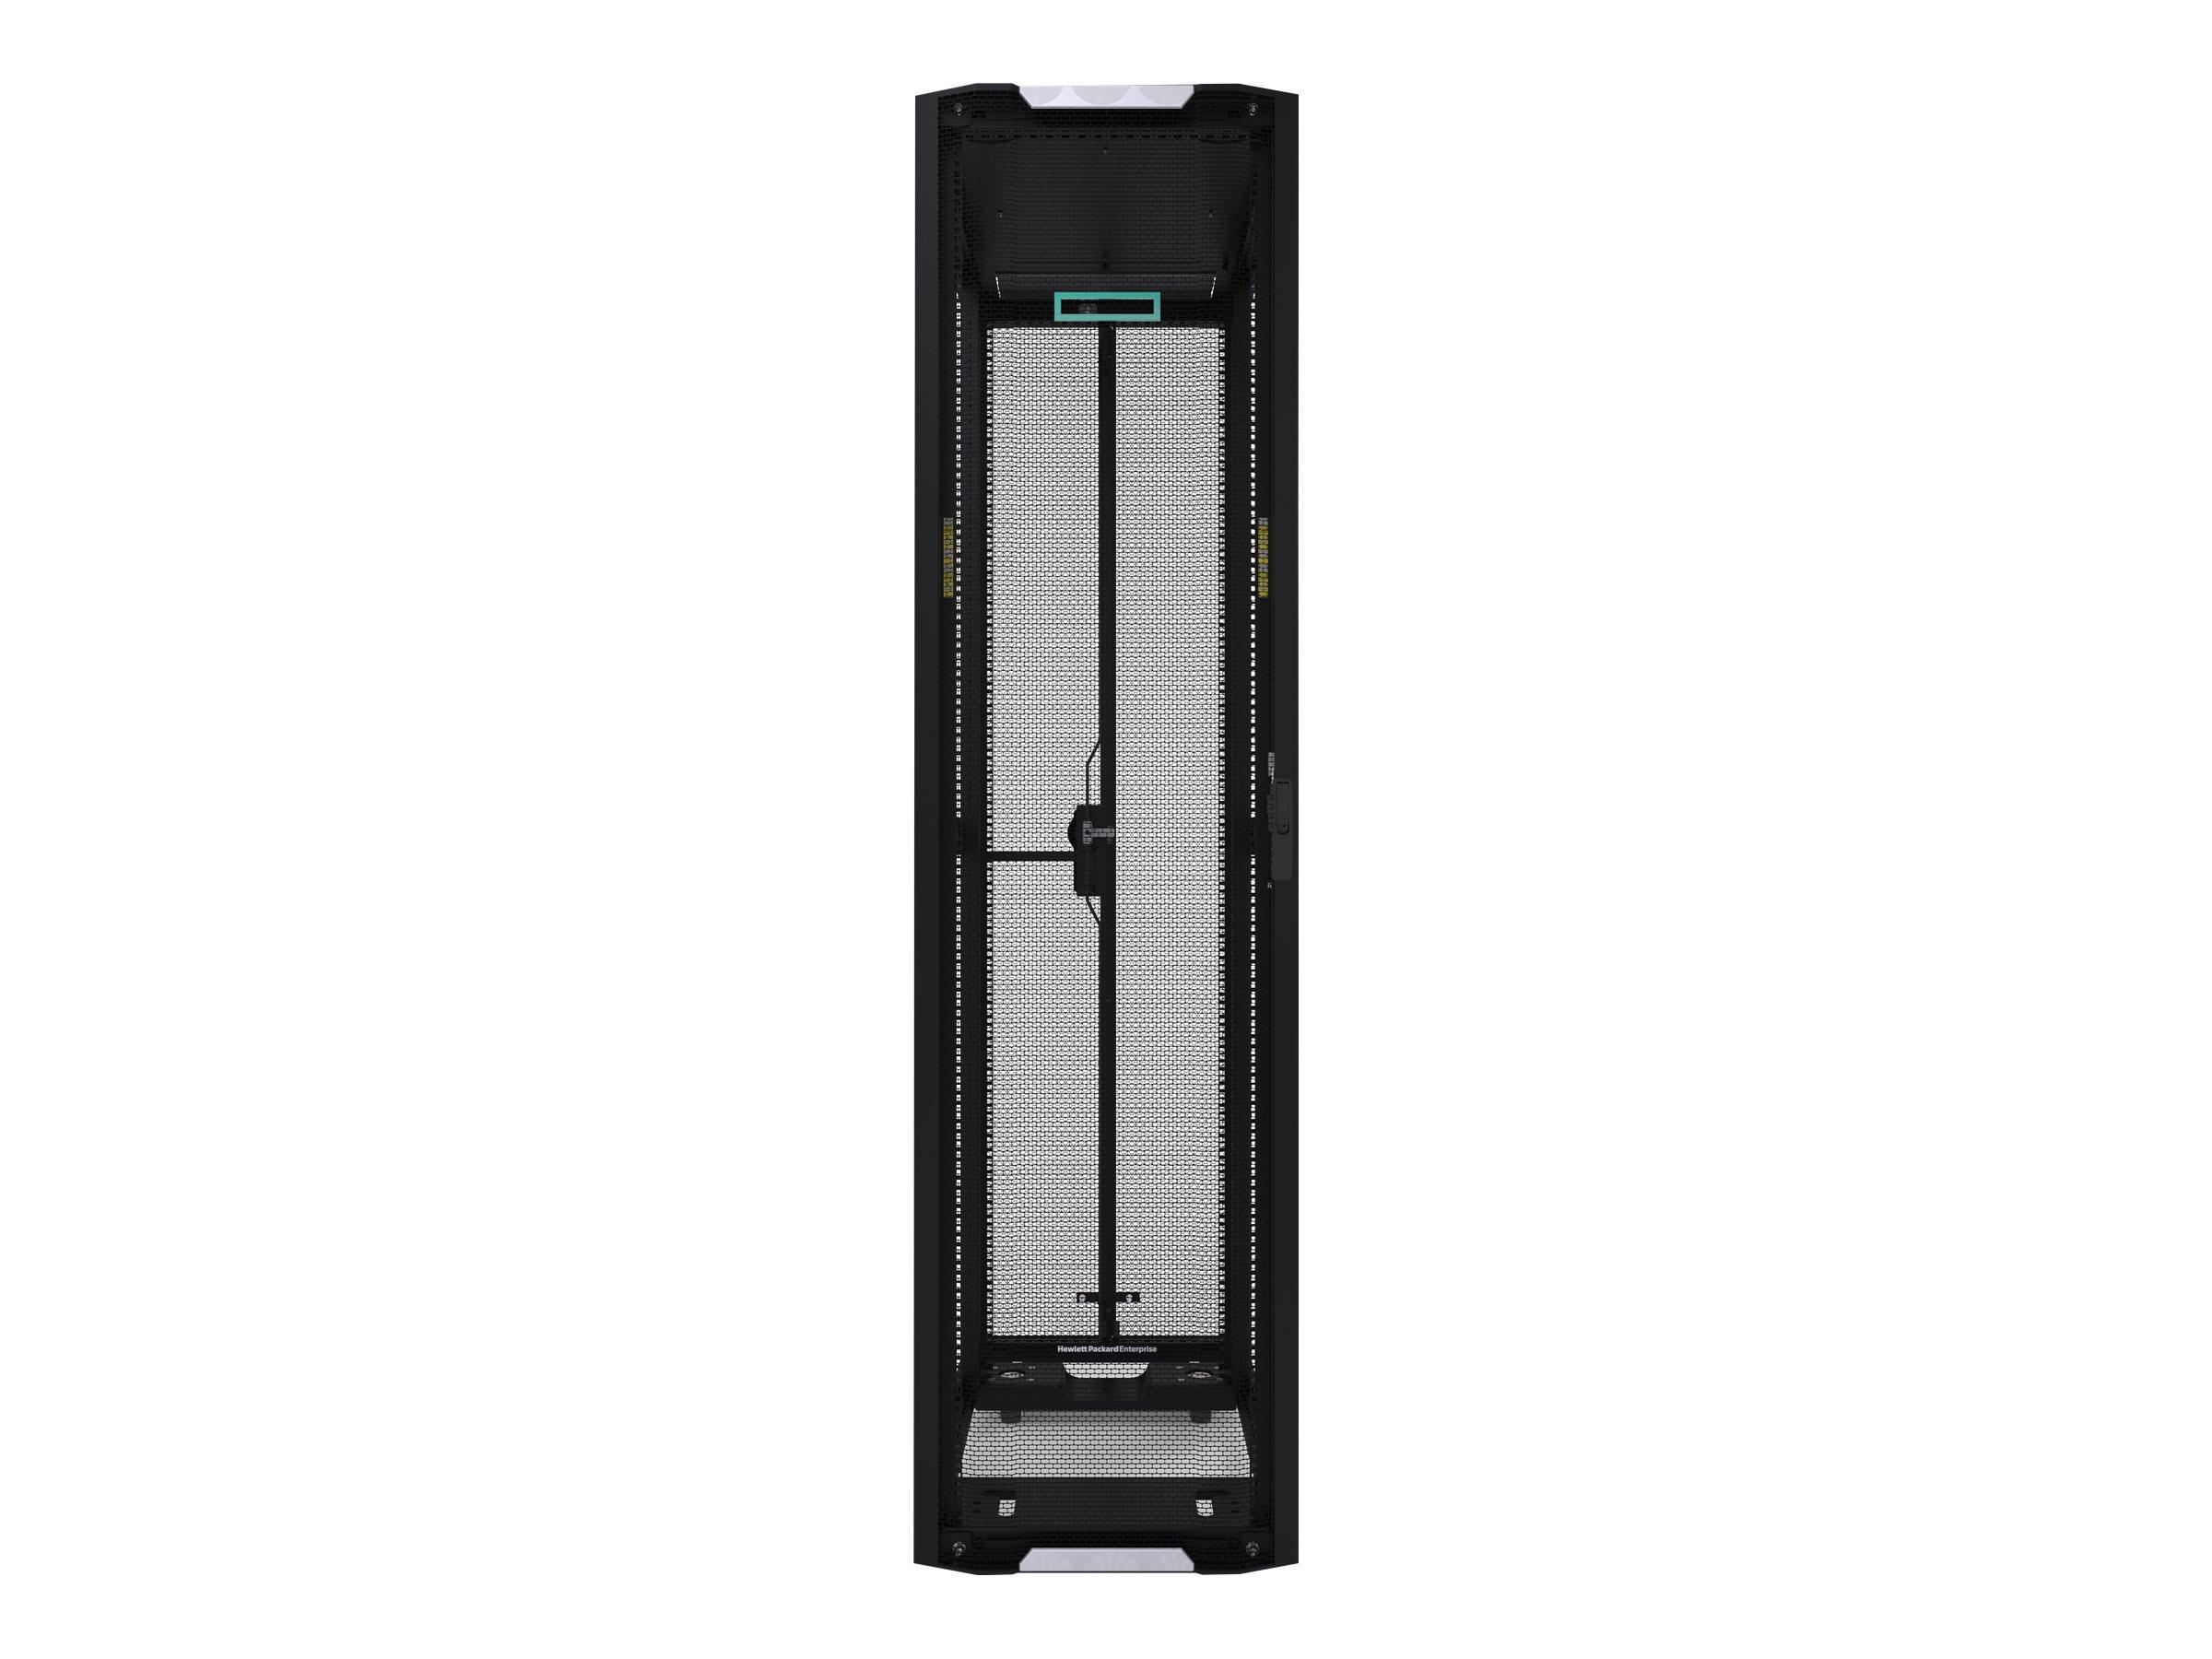 HPE 600mm x 1200mm G2 Enterprise Pallet Rack - rack - 48U